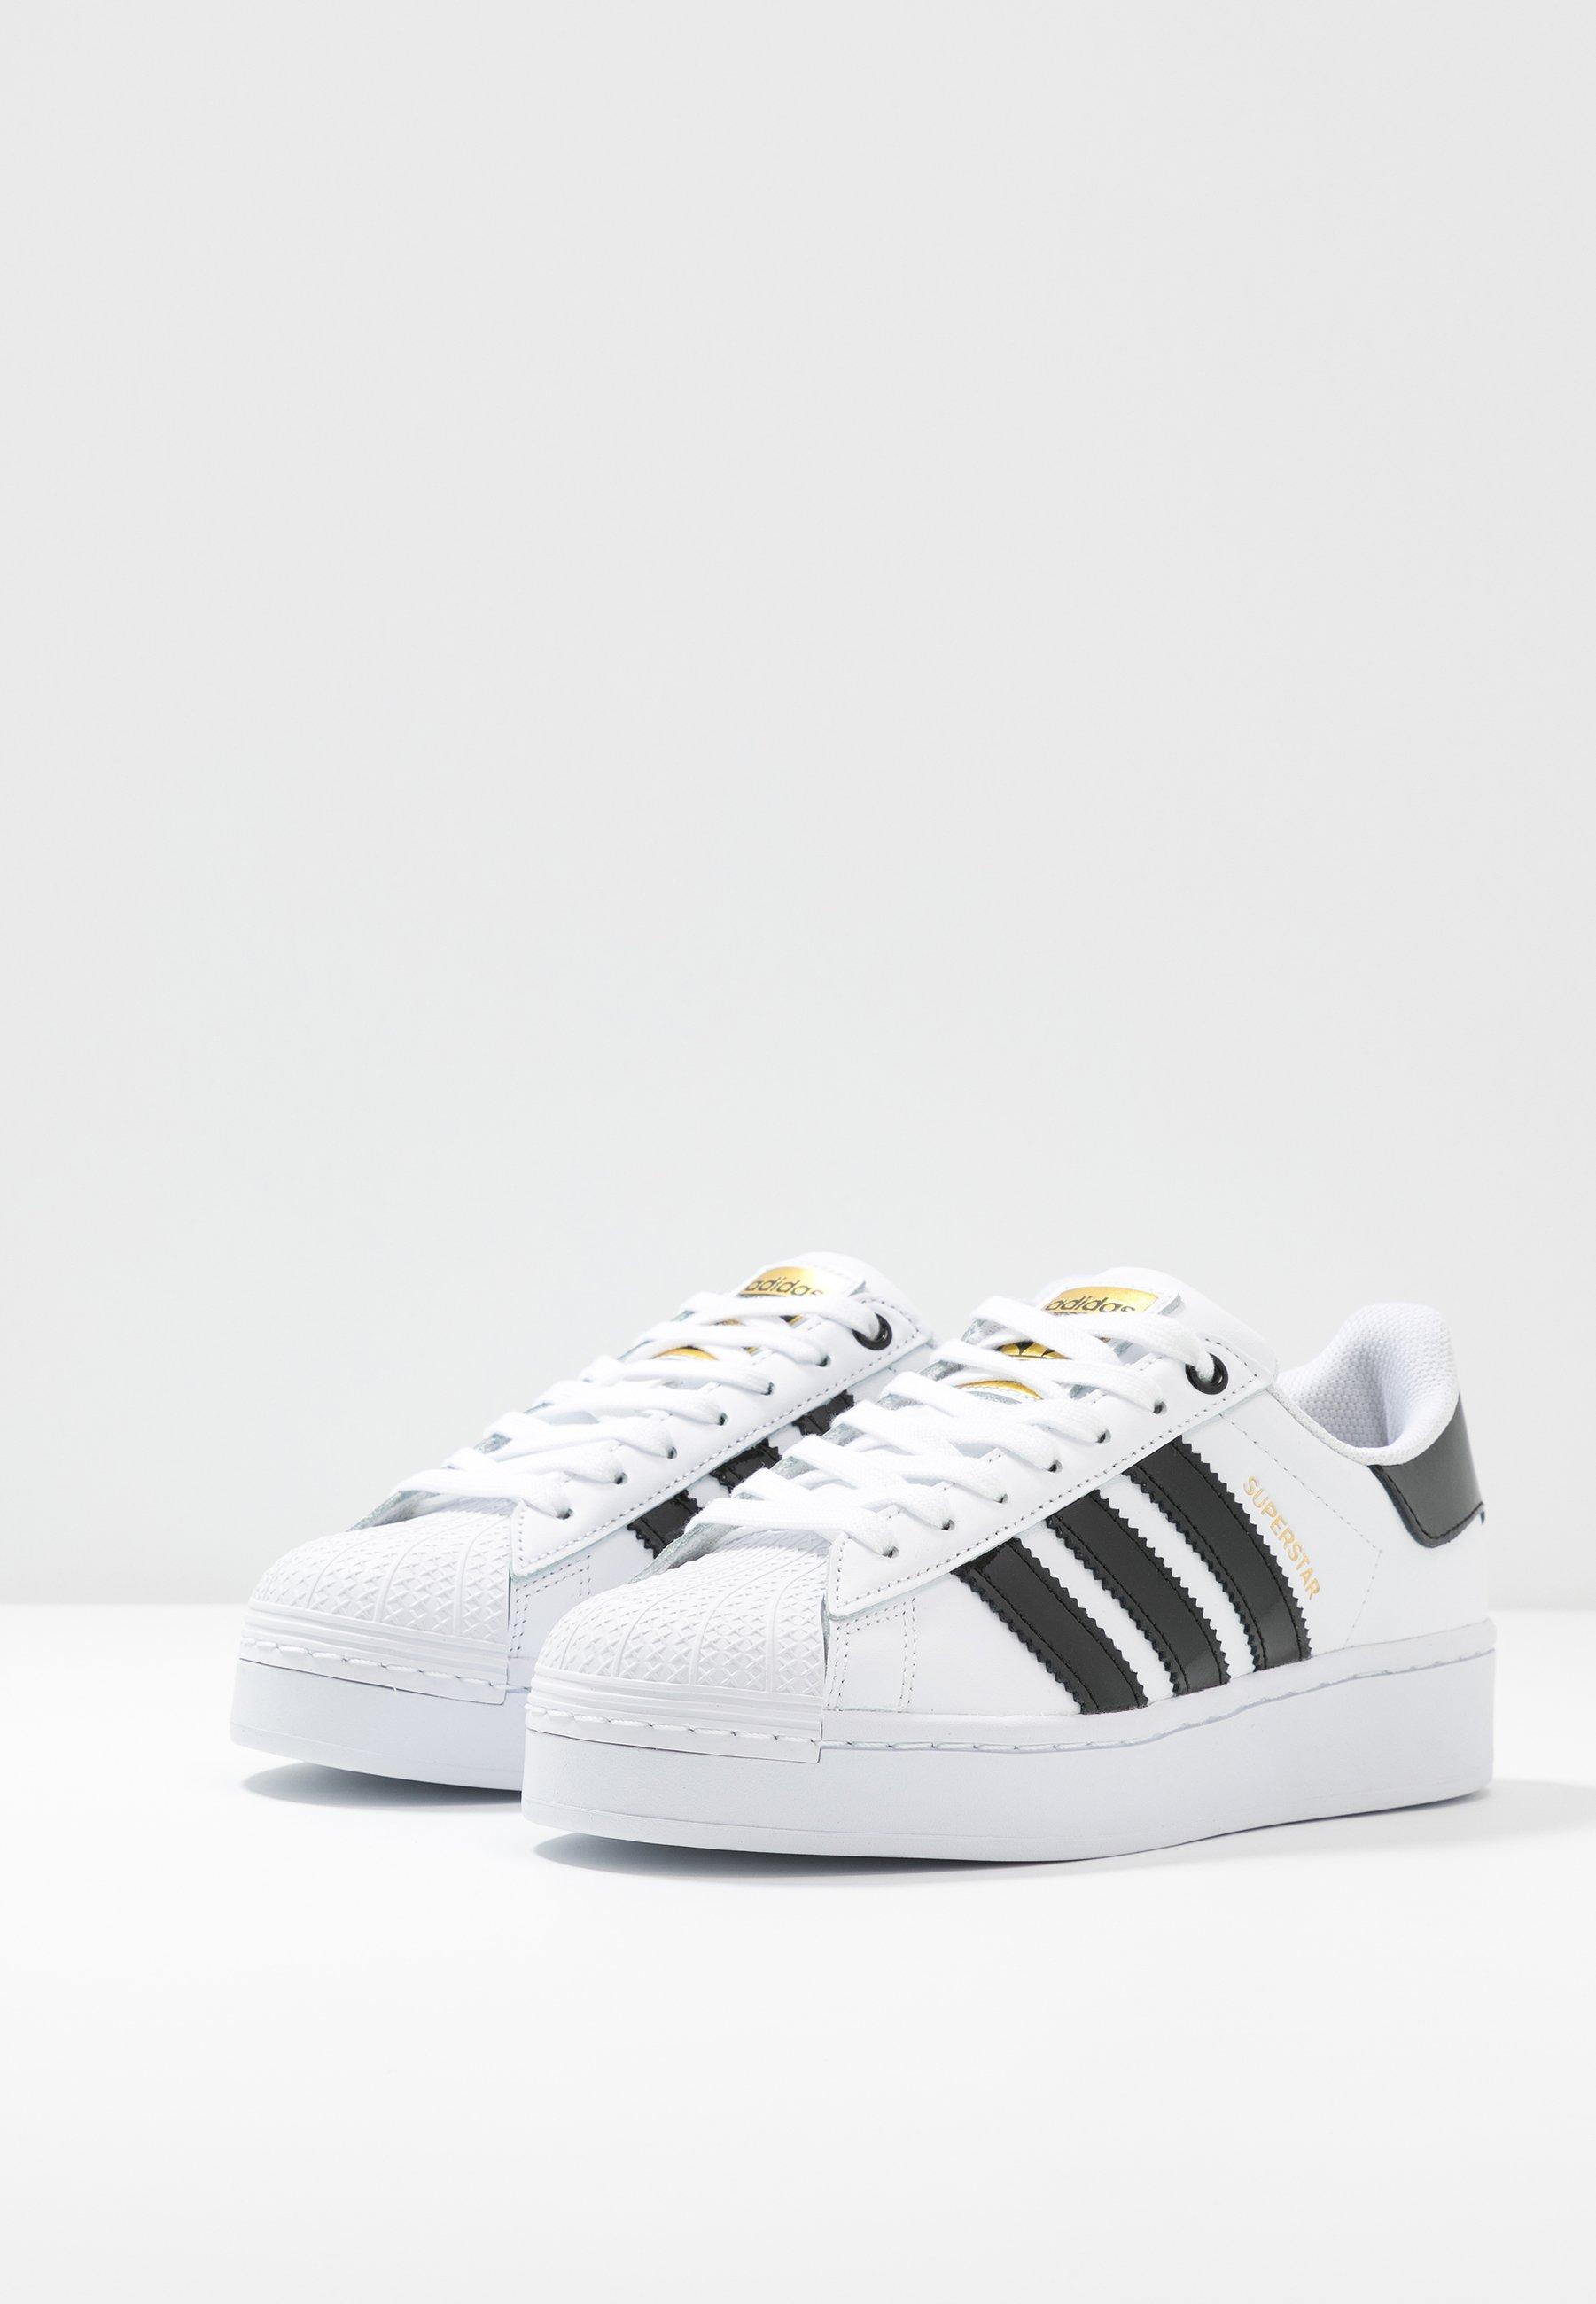 Adidas Originals Superstar Bold - Joggesko Footwear White/clear Black/gold Metallic/hvit